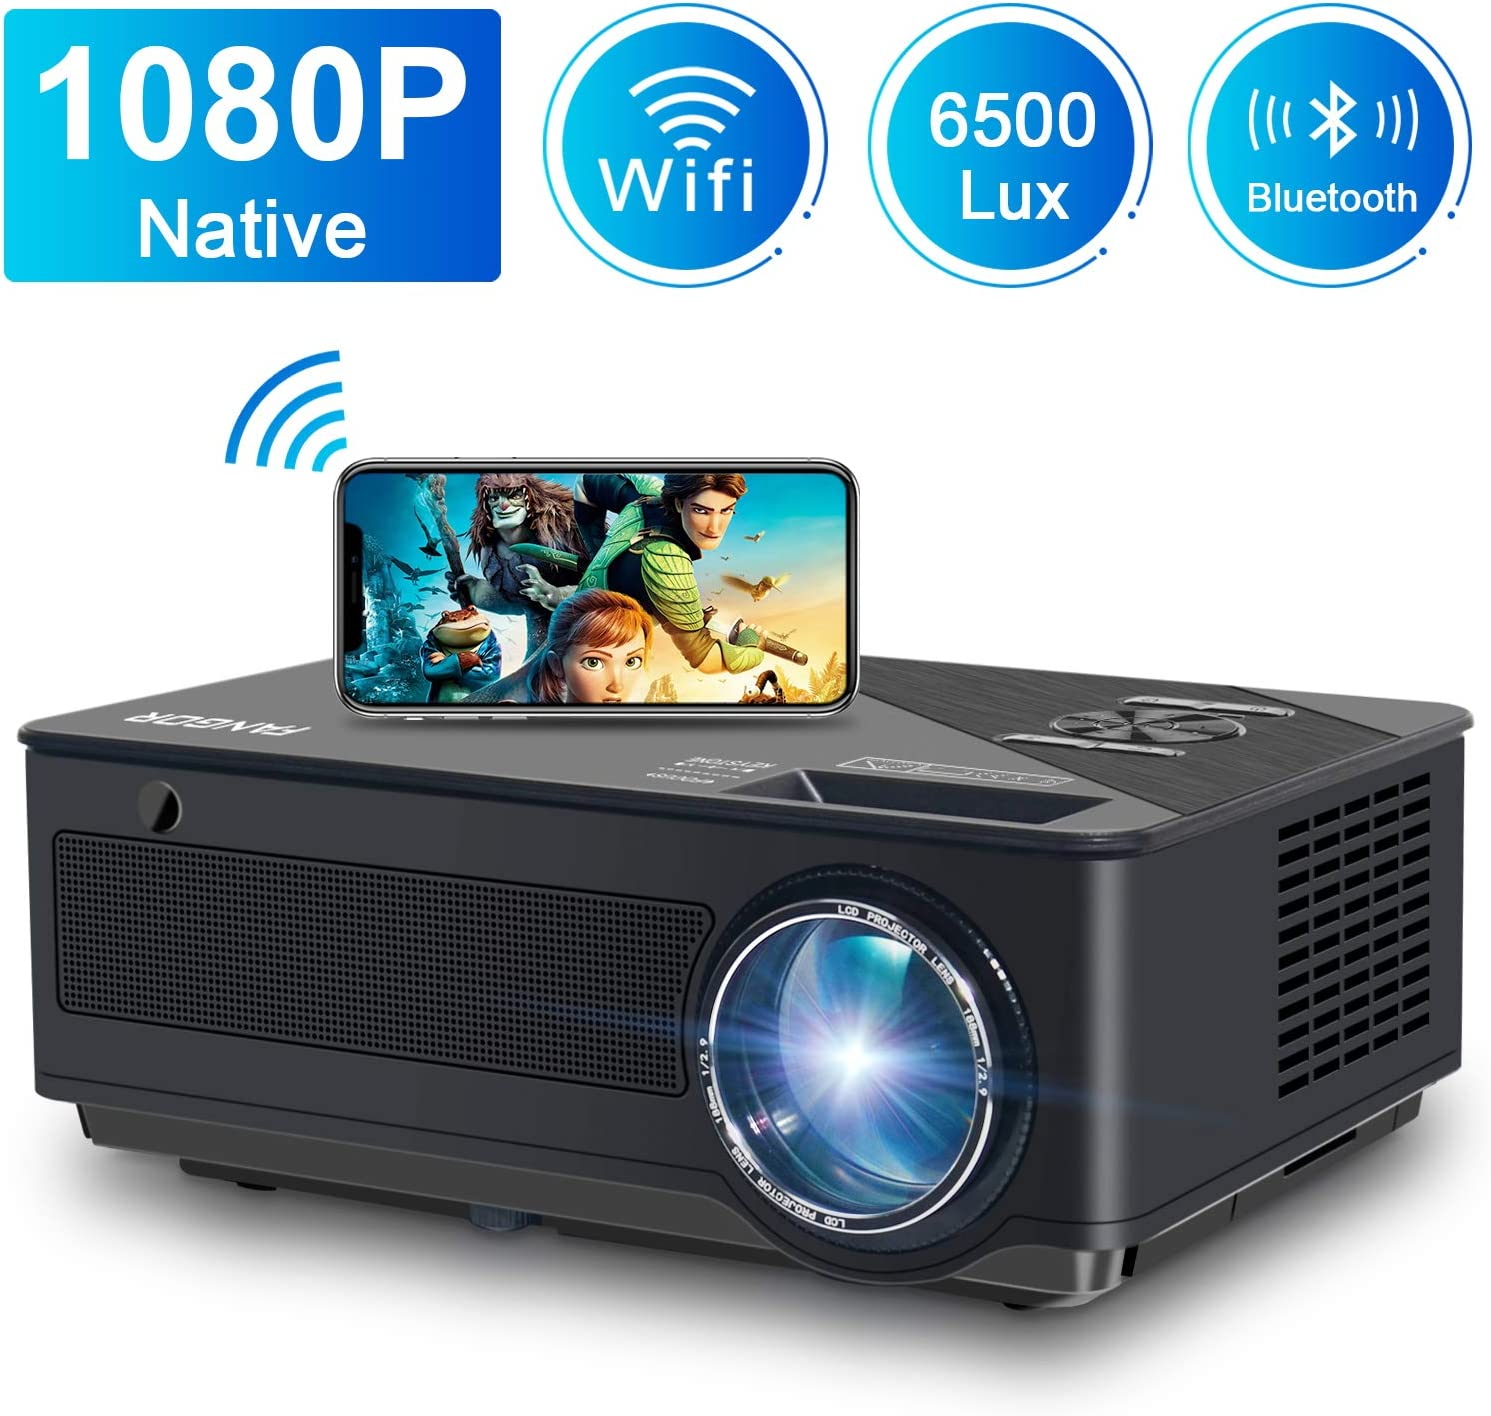 Proyector, FANGOR 6500 Lúmenes Full HD WiFi Proyector 1080P Nativo Vídeoproyector 4K Corrección Tropezoidal Cine en Casa Proyector Bluetooth 65000 Horas, Compatible con HDMI/USB/SD/VGA/AV/TV Box